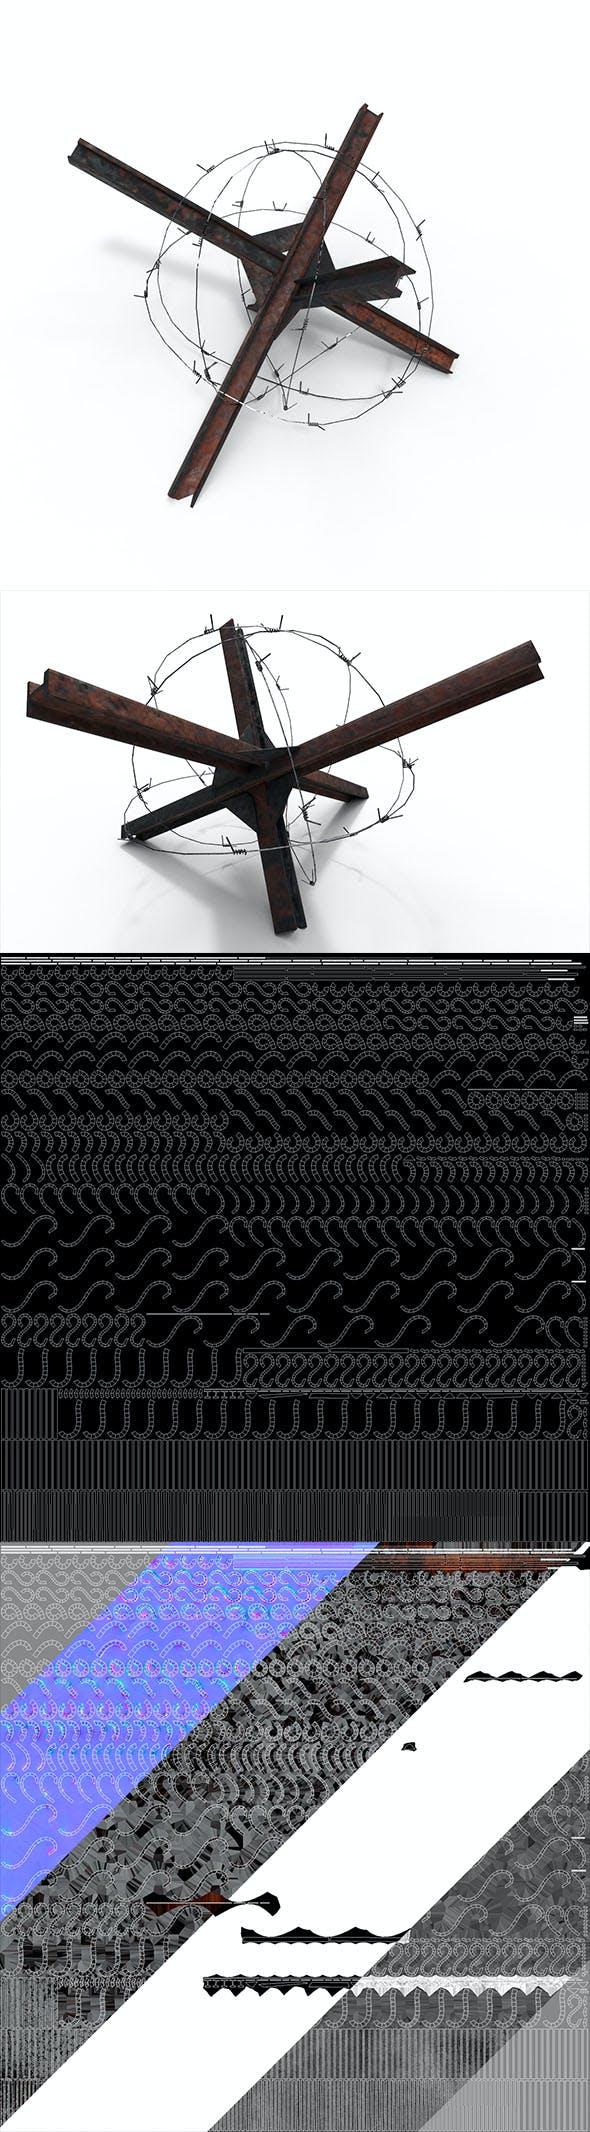 anti-tank hedgehog spines PBR - 3DOcean Item for Sale